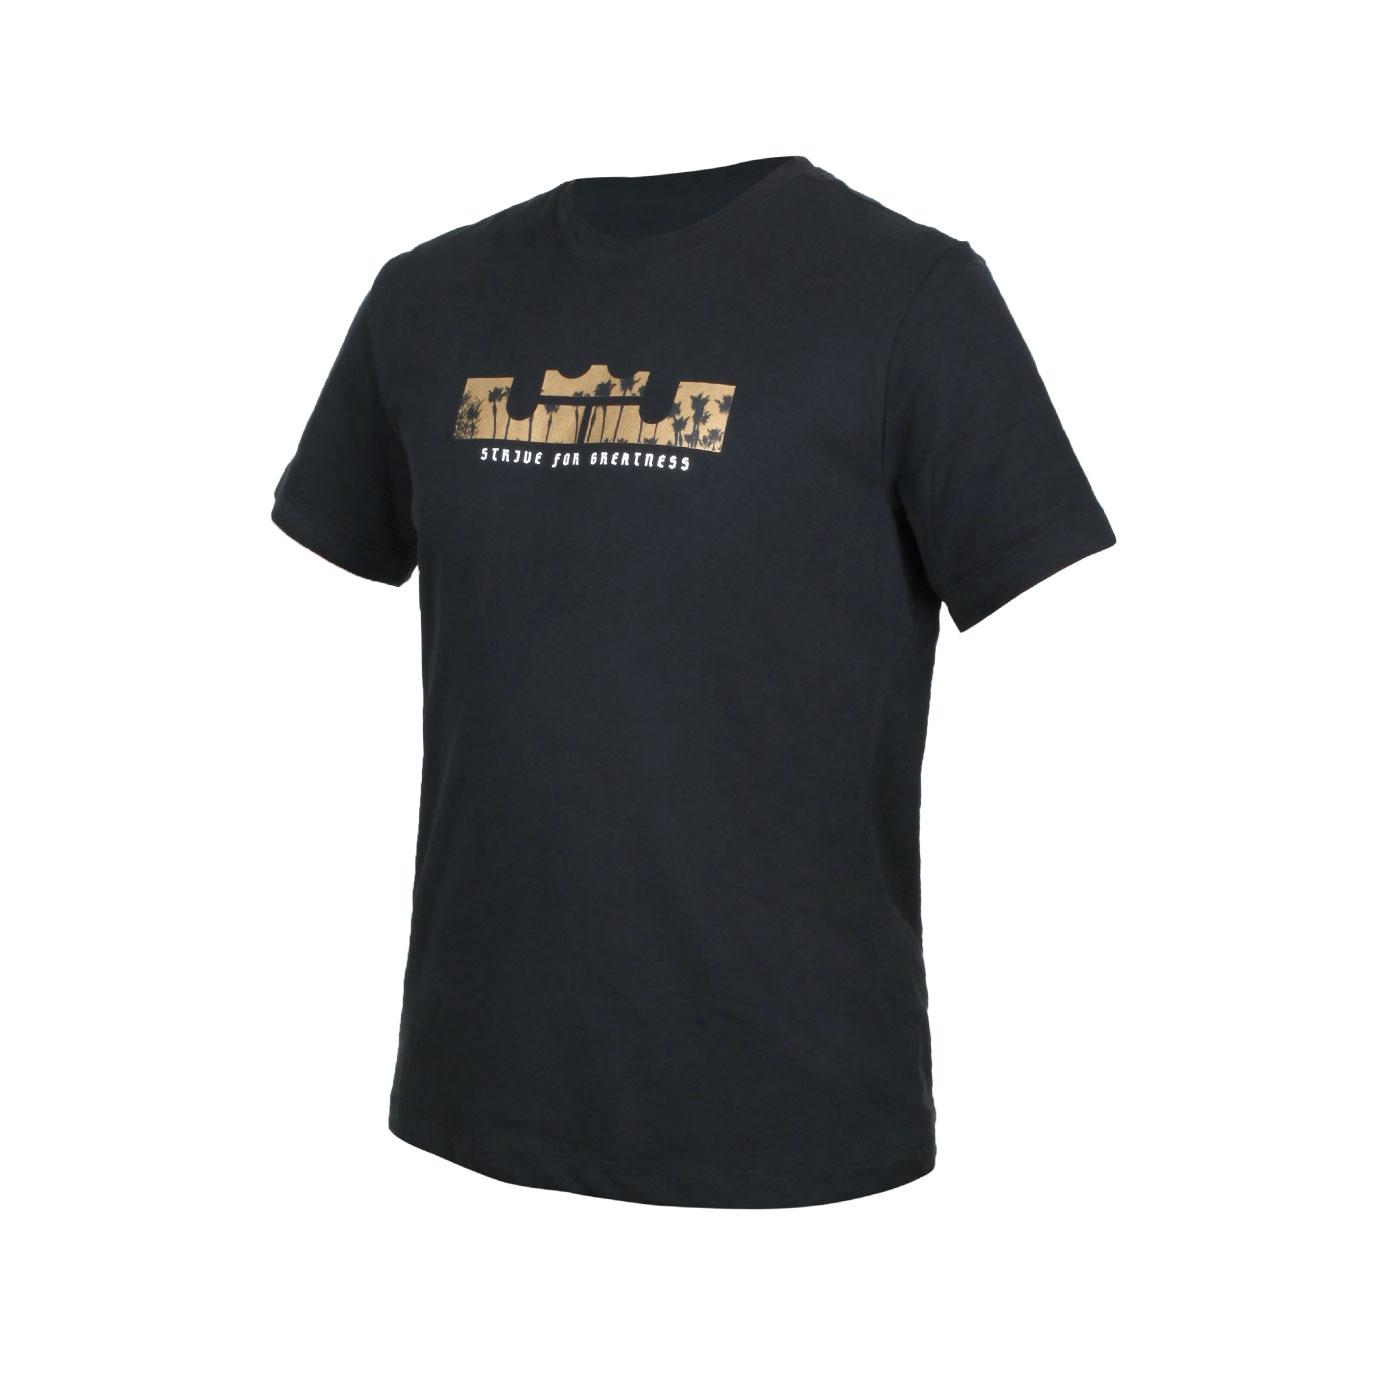 NIKE 男款短袖T恤 DB6179-011 - 黑金